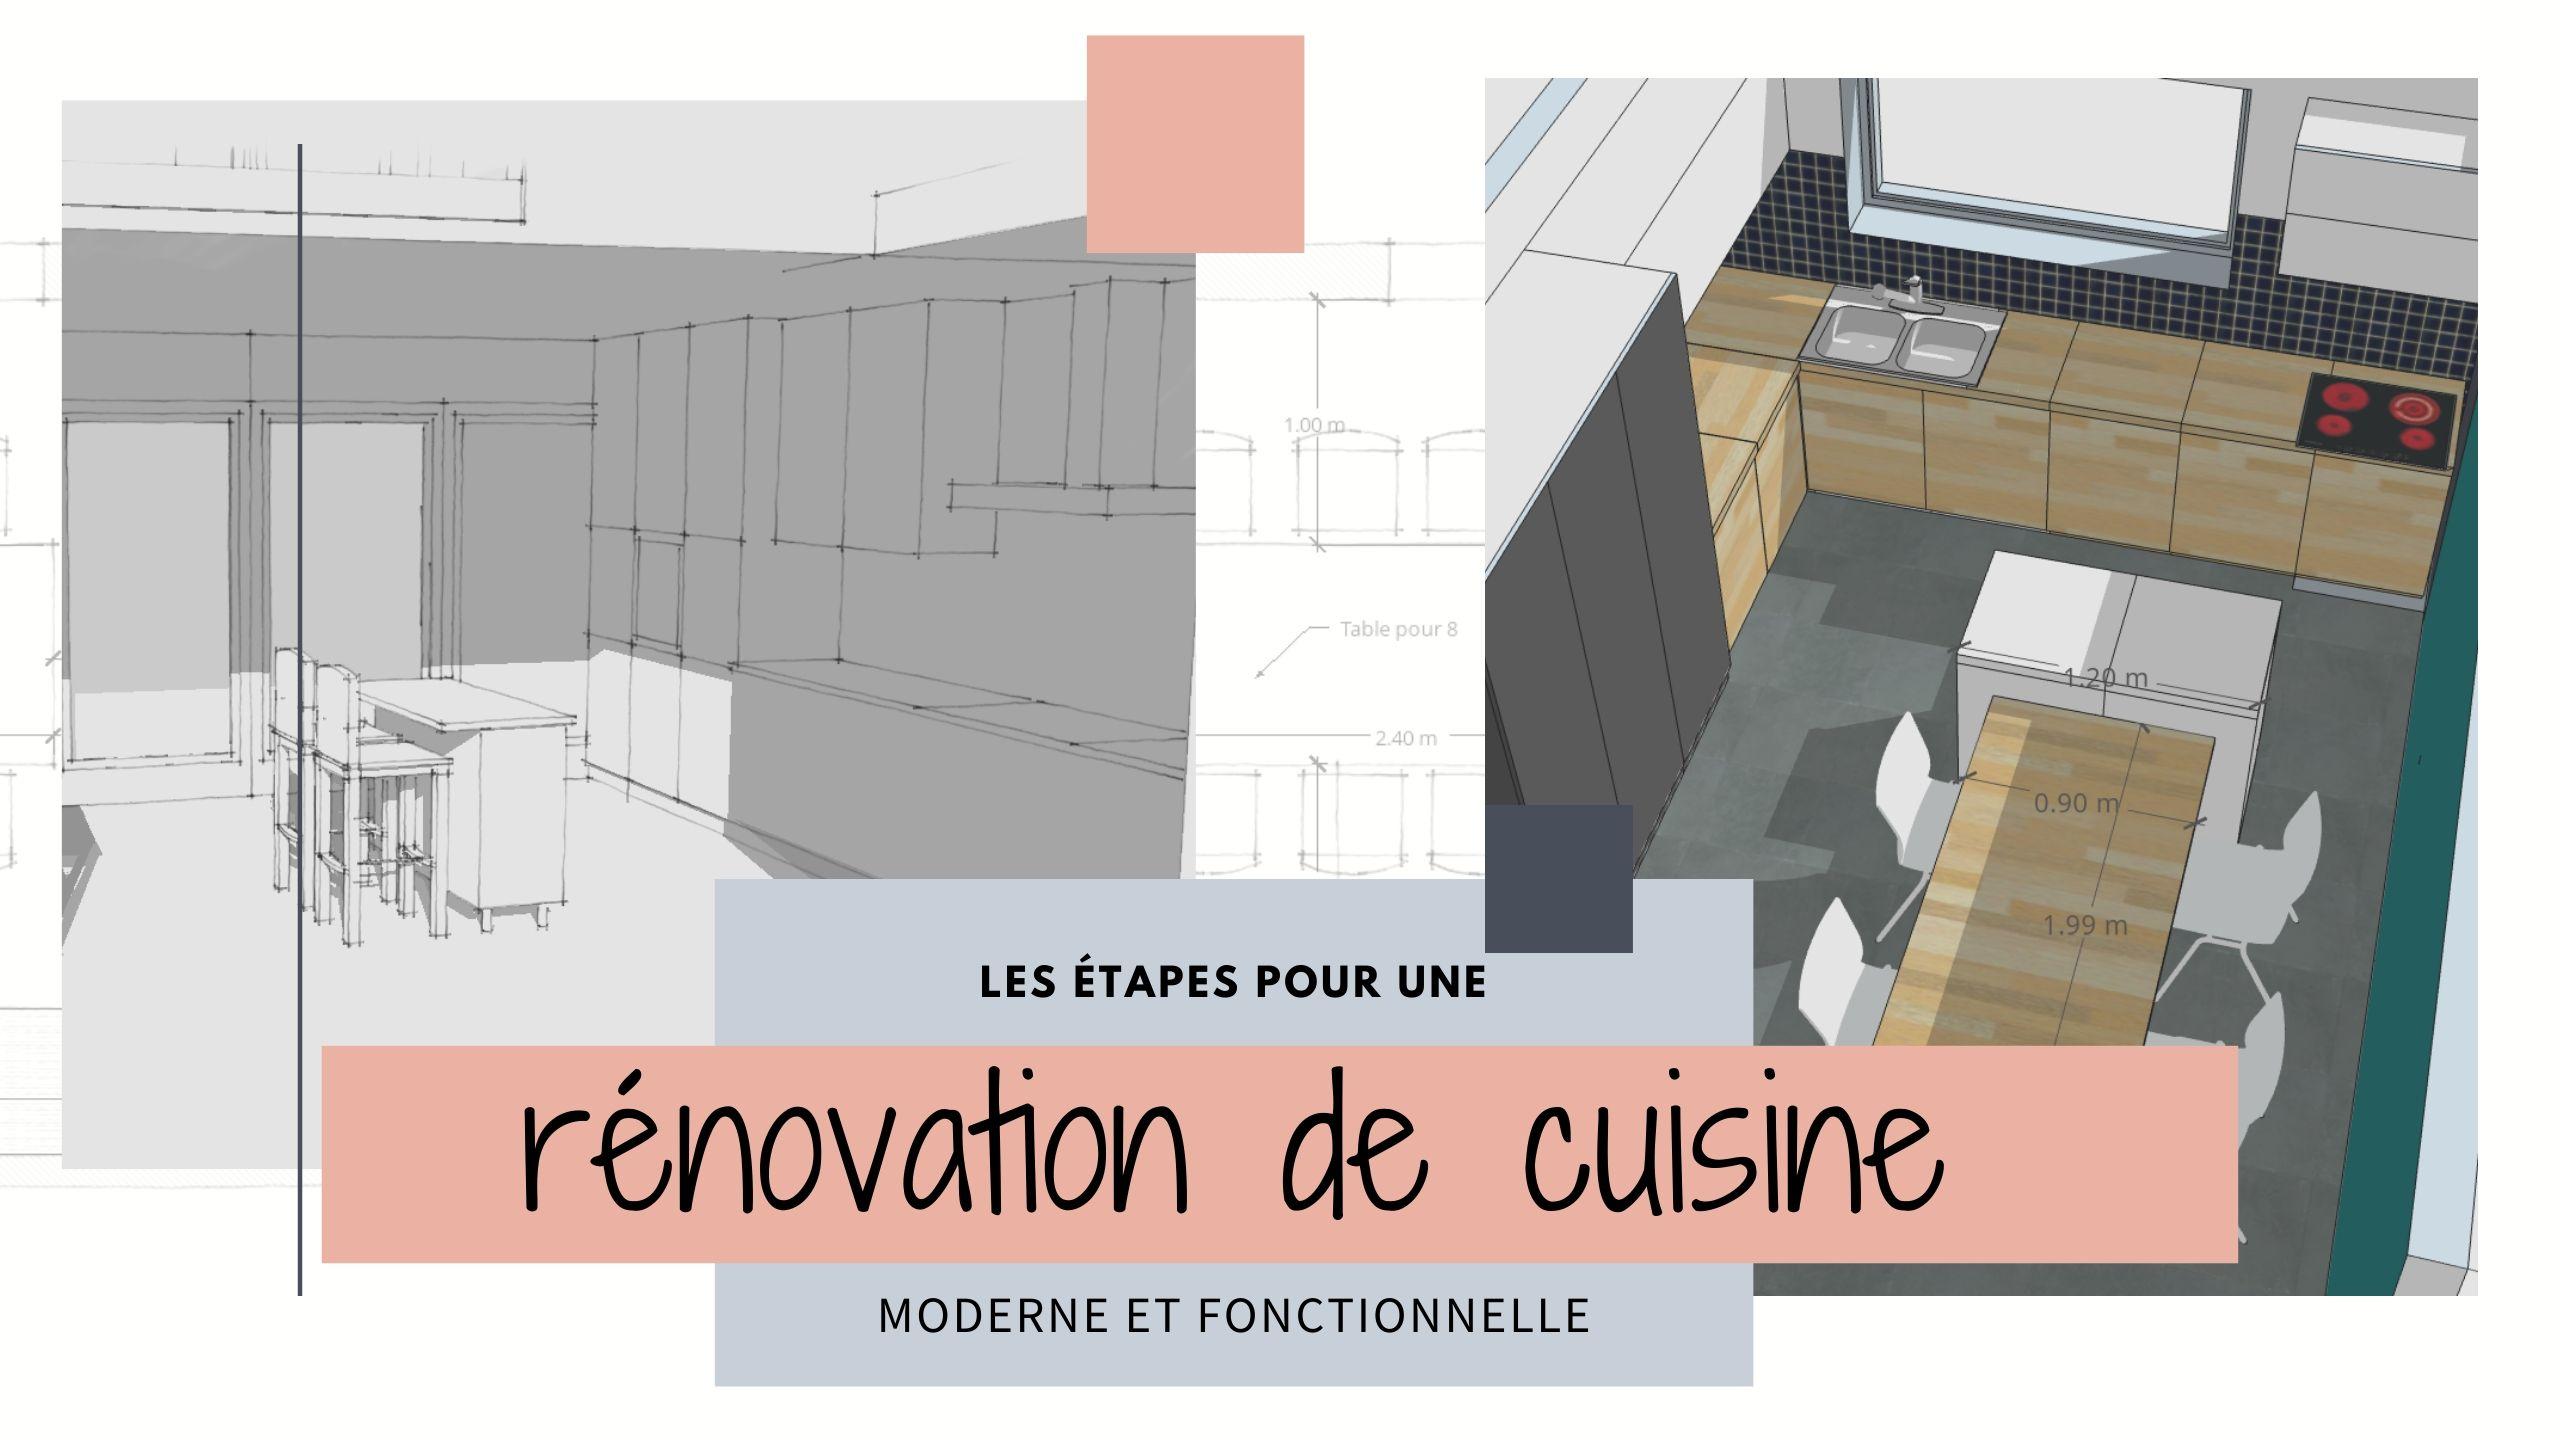 renovation de cuisine